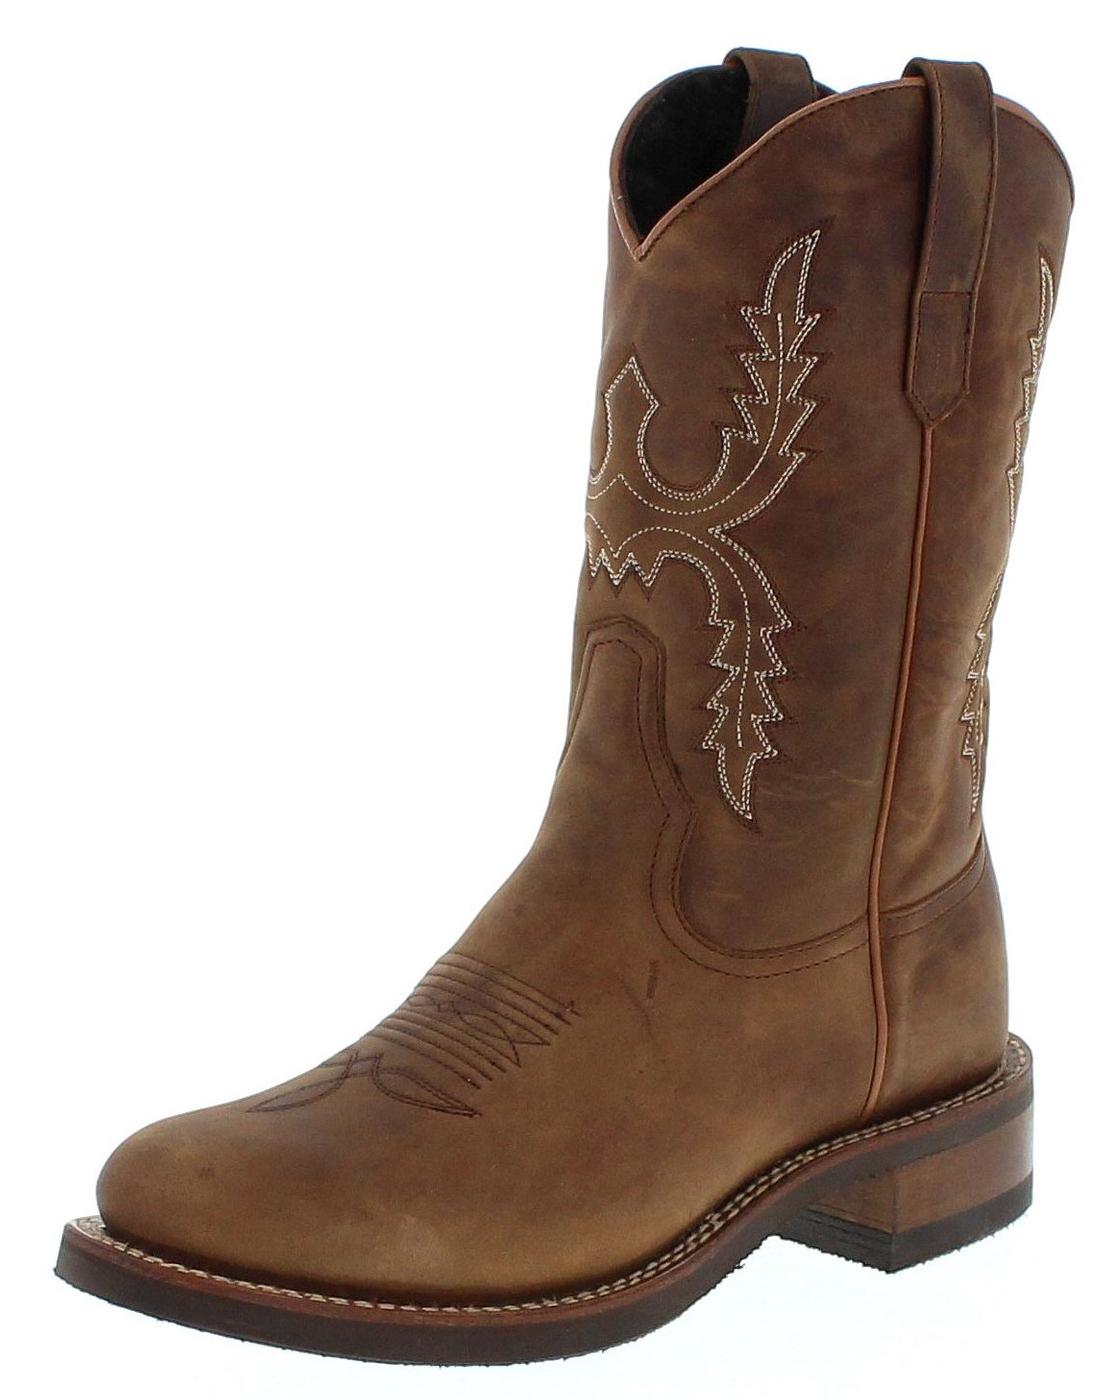 Sendra Boots 11615 Tang Damen Westernreitstiefel mit Merinofell Futter - braun